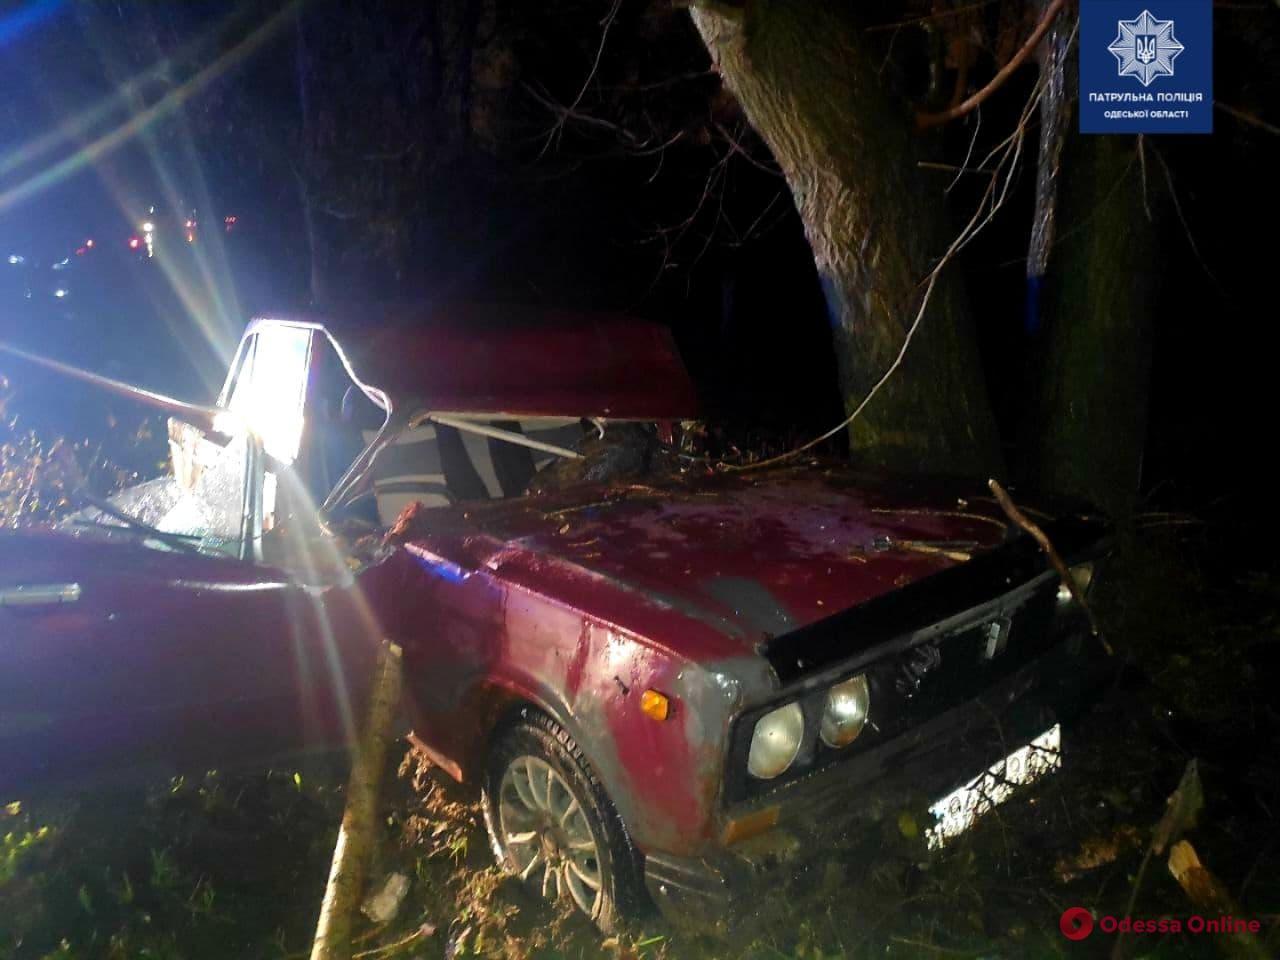 На Балтской дороге дерево рухнуло на легковушку – двое пострадавших